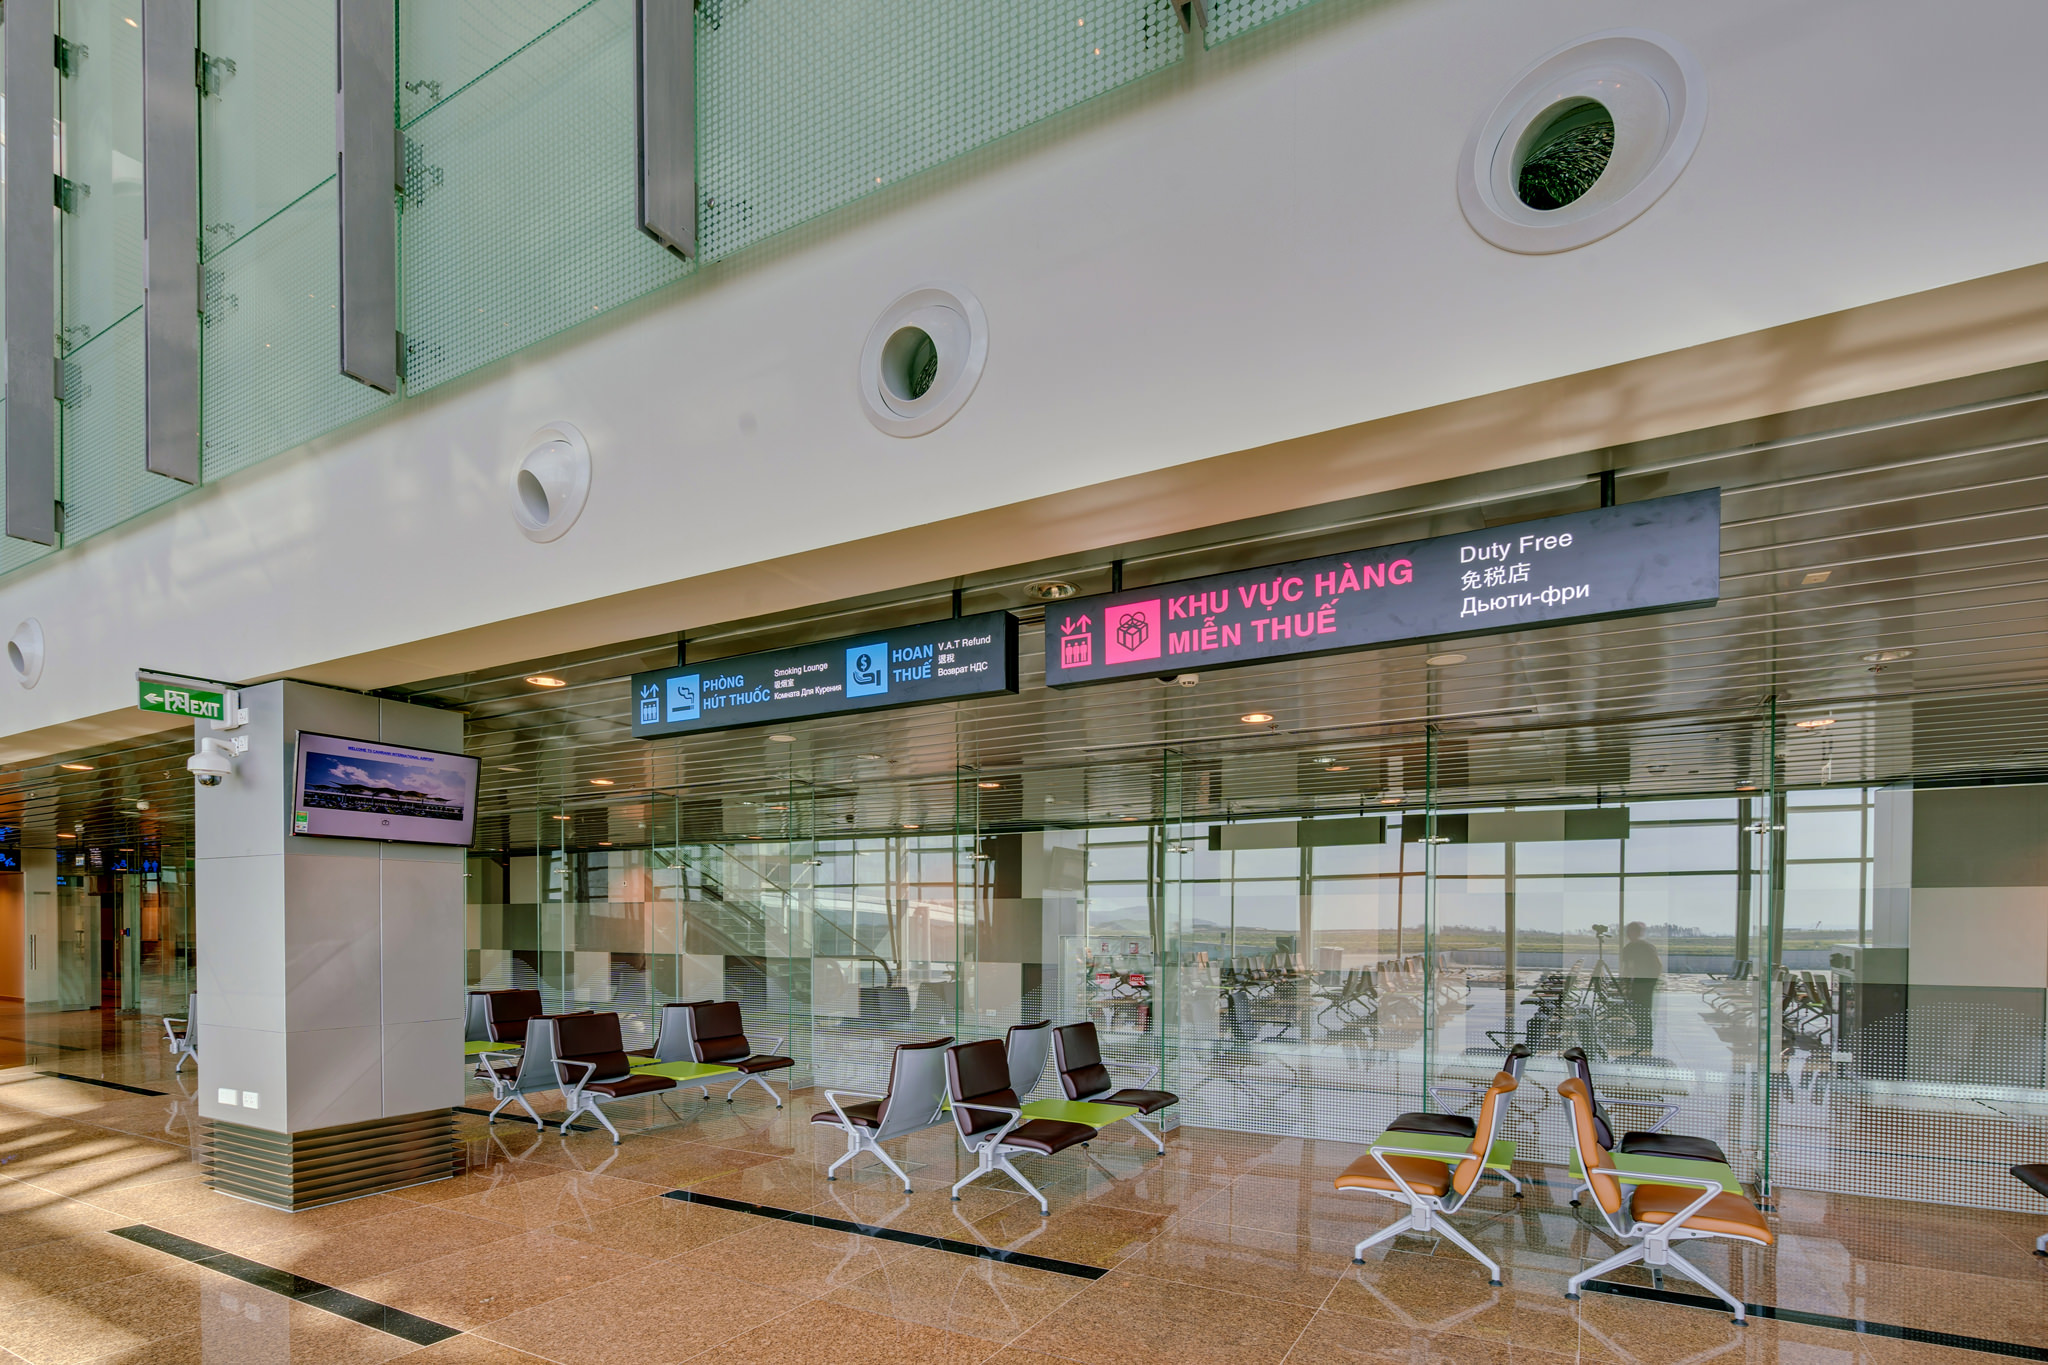 20180626 - Cam Ranh Airport - Architecture - 0186.jpg